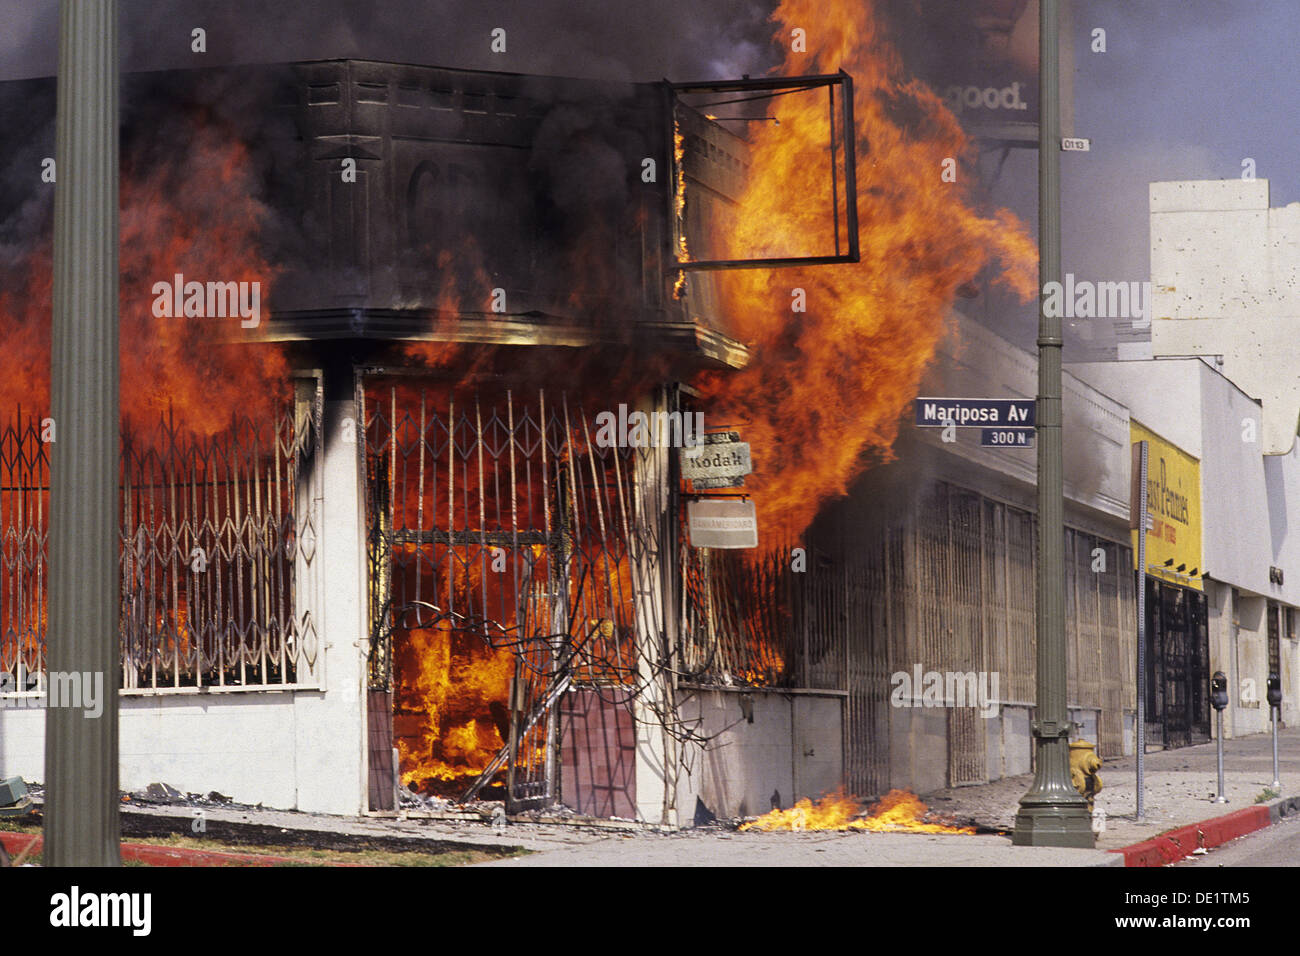 Scene from Los Angeles Riots, 1992. California. USA - Stock Image